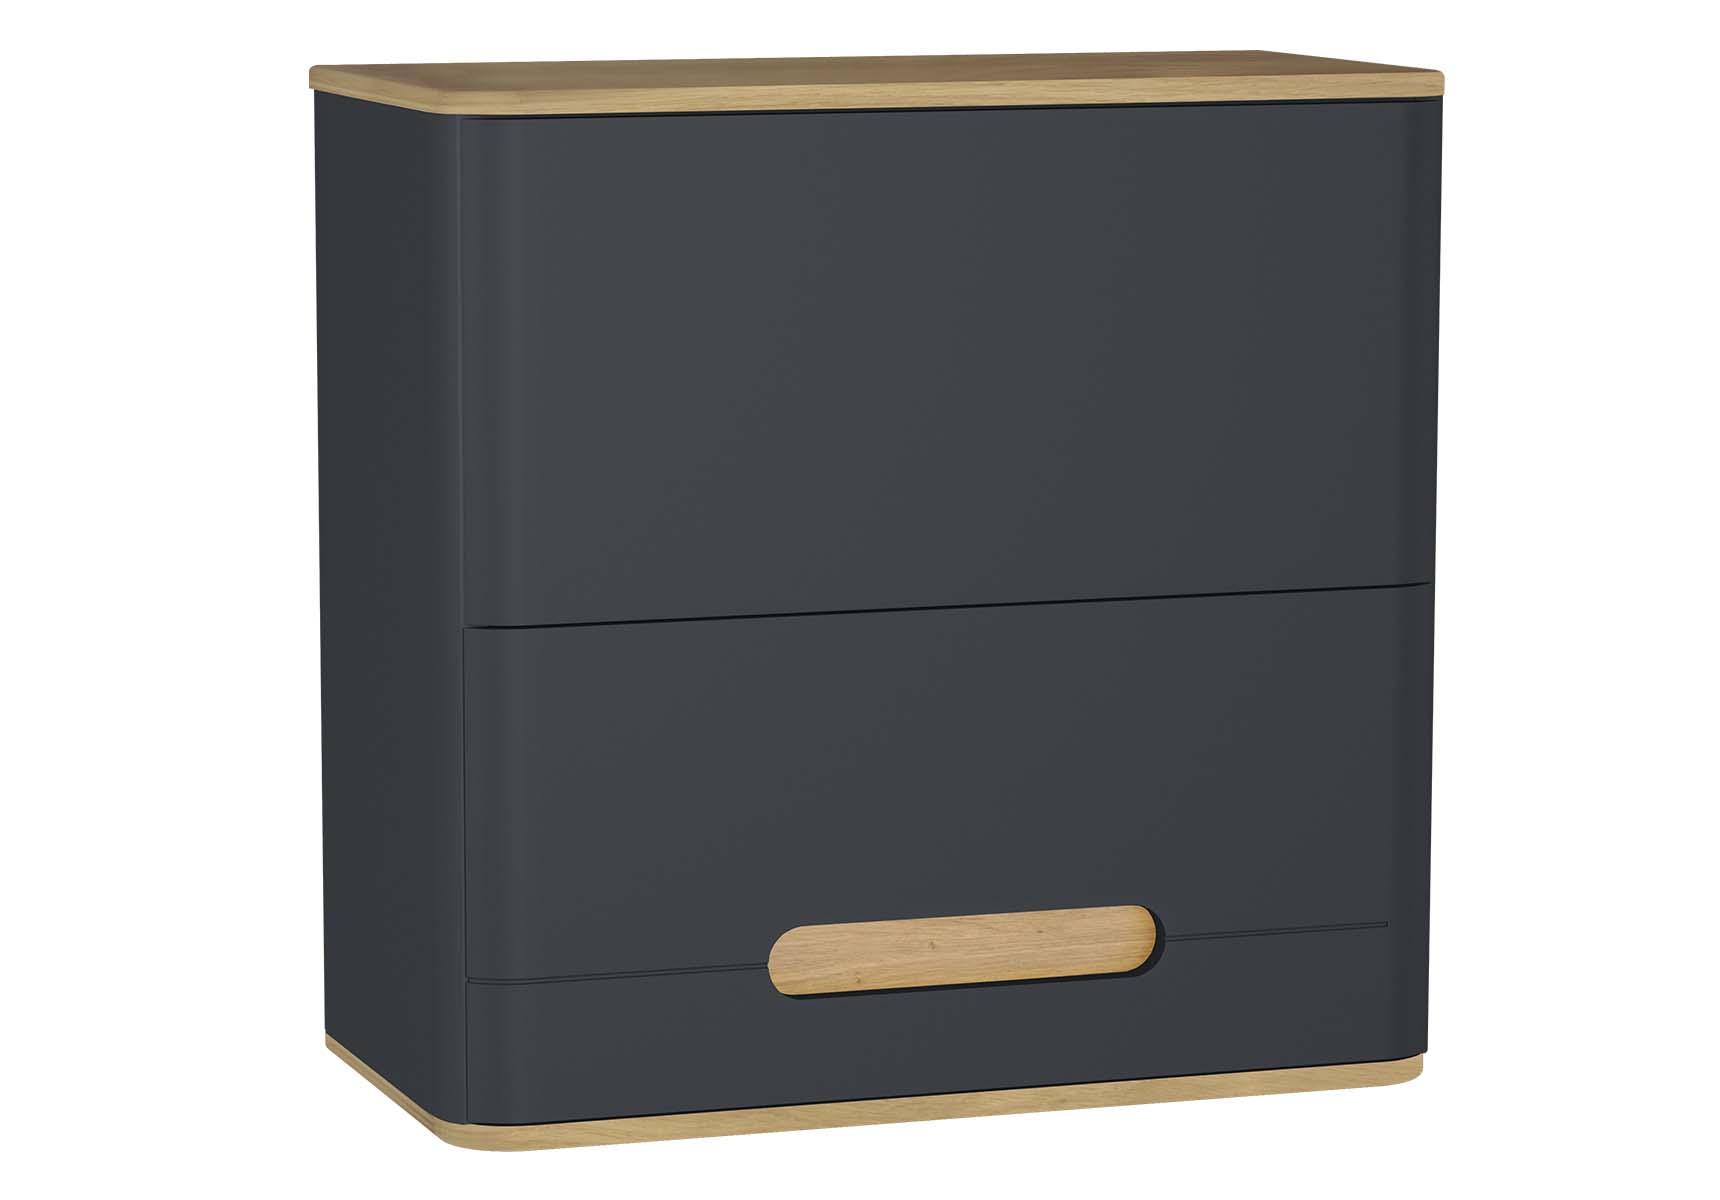 Sento Upper Cabinet, 70 cm, Matte Anthracite